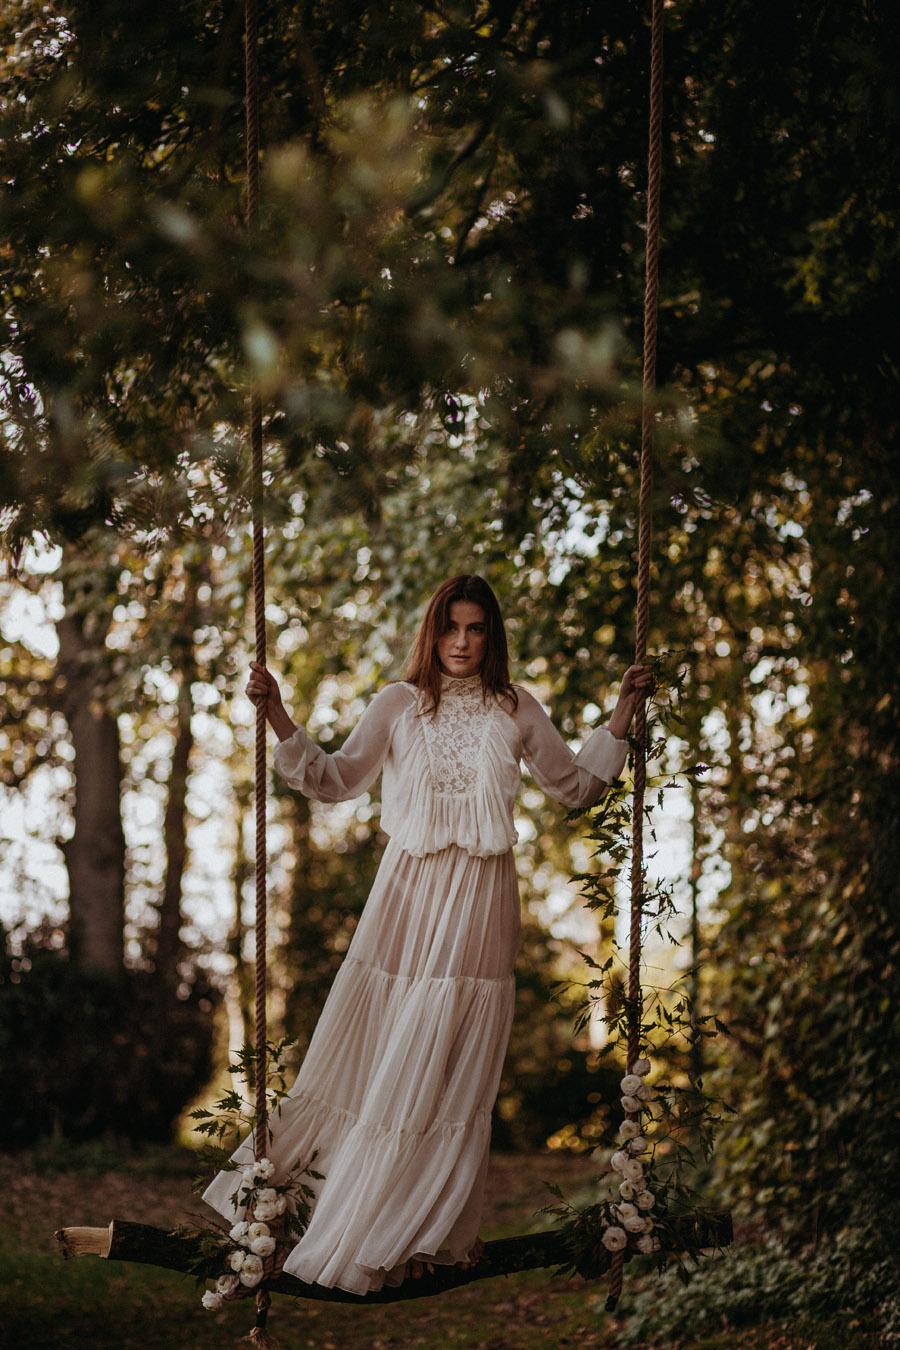 Sanyukta Shrestha autumn daydream bridal collection 2020 (1)